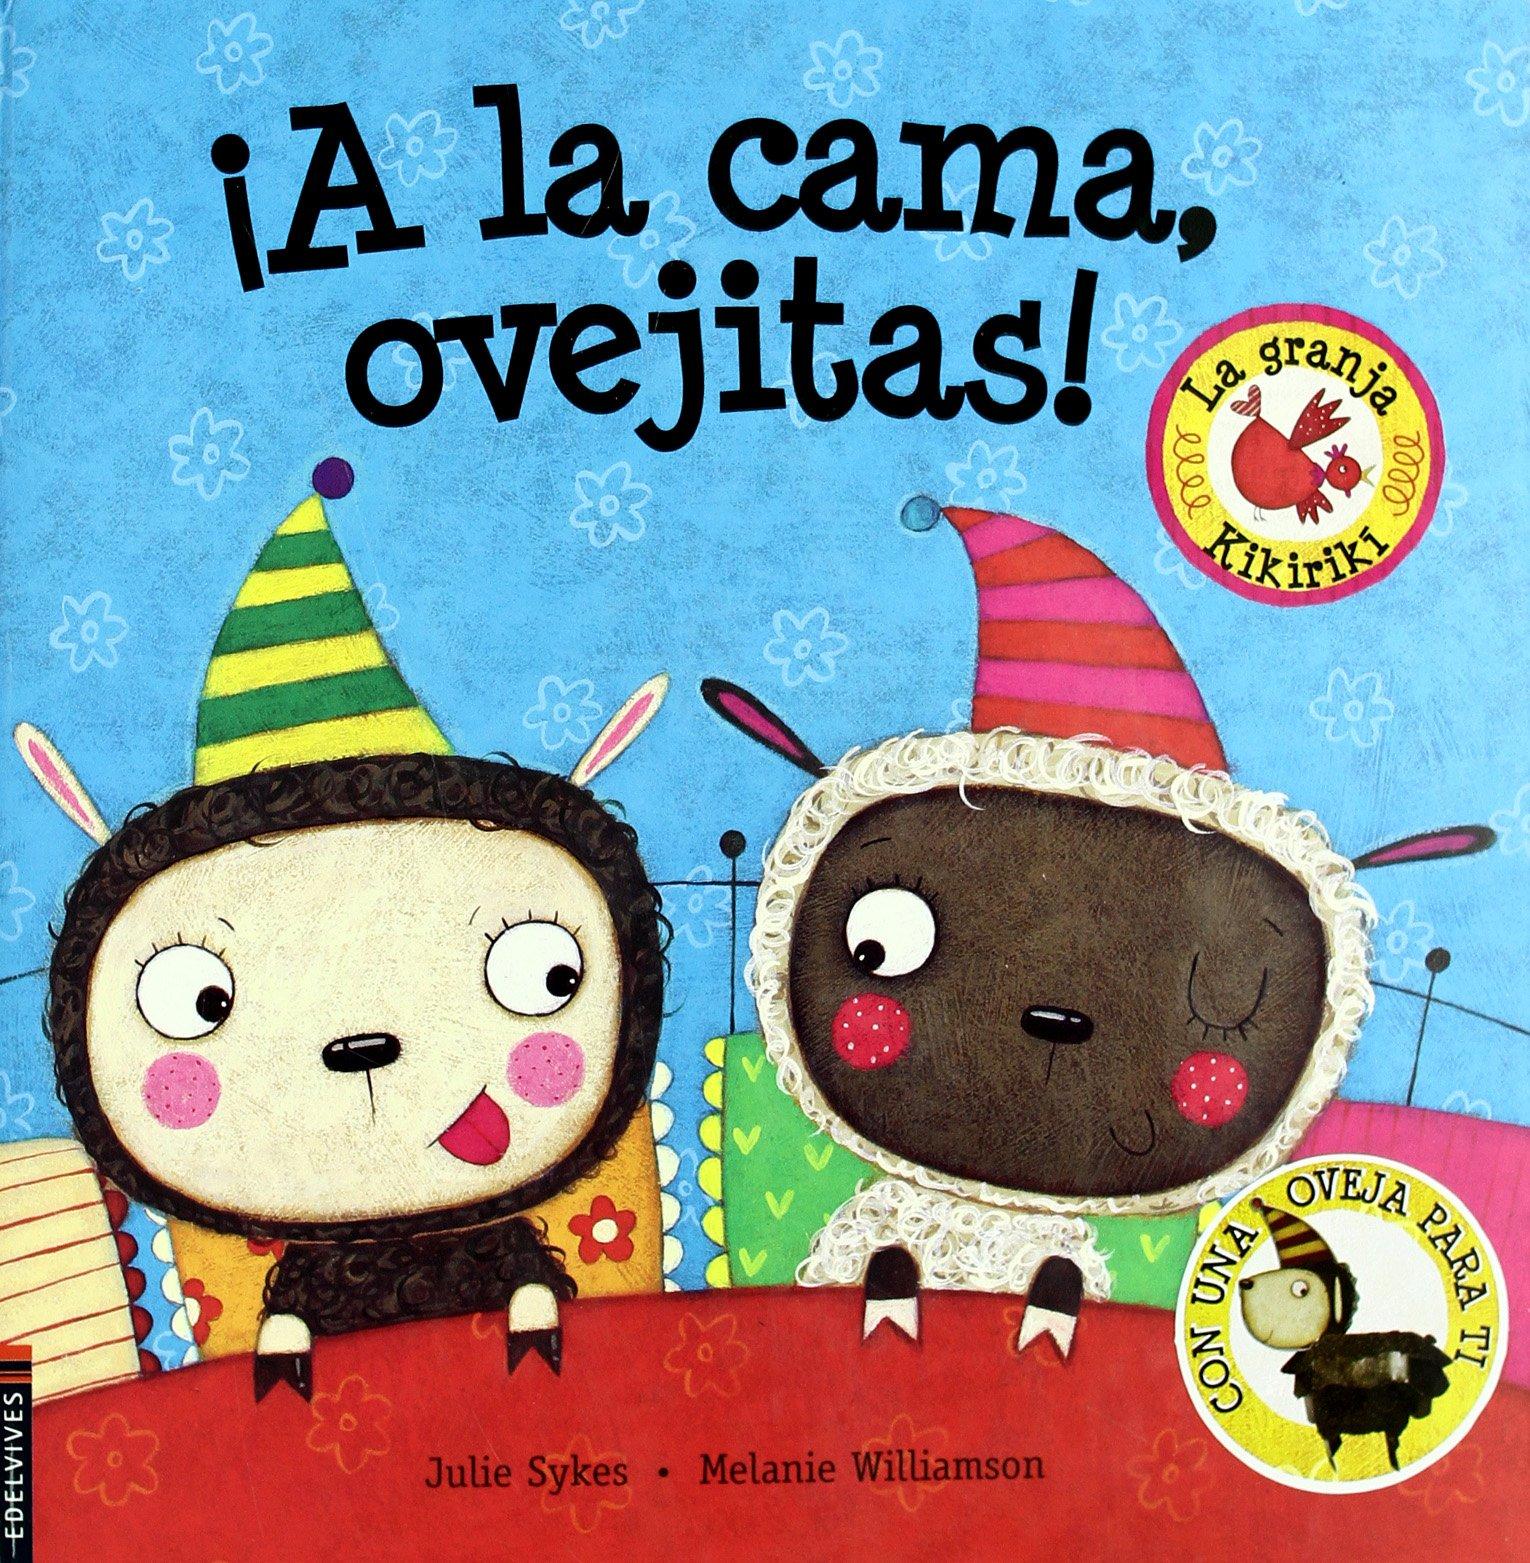 Download A la cama ovejitas! (La granja Kikiriki/ The Kikiriki Farm) (Spanish Edition) pdf epub